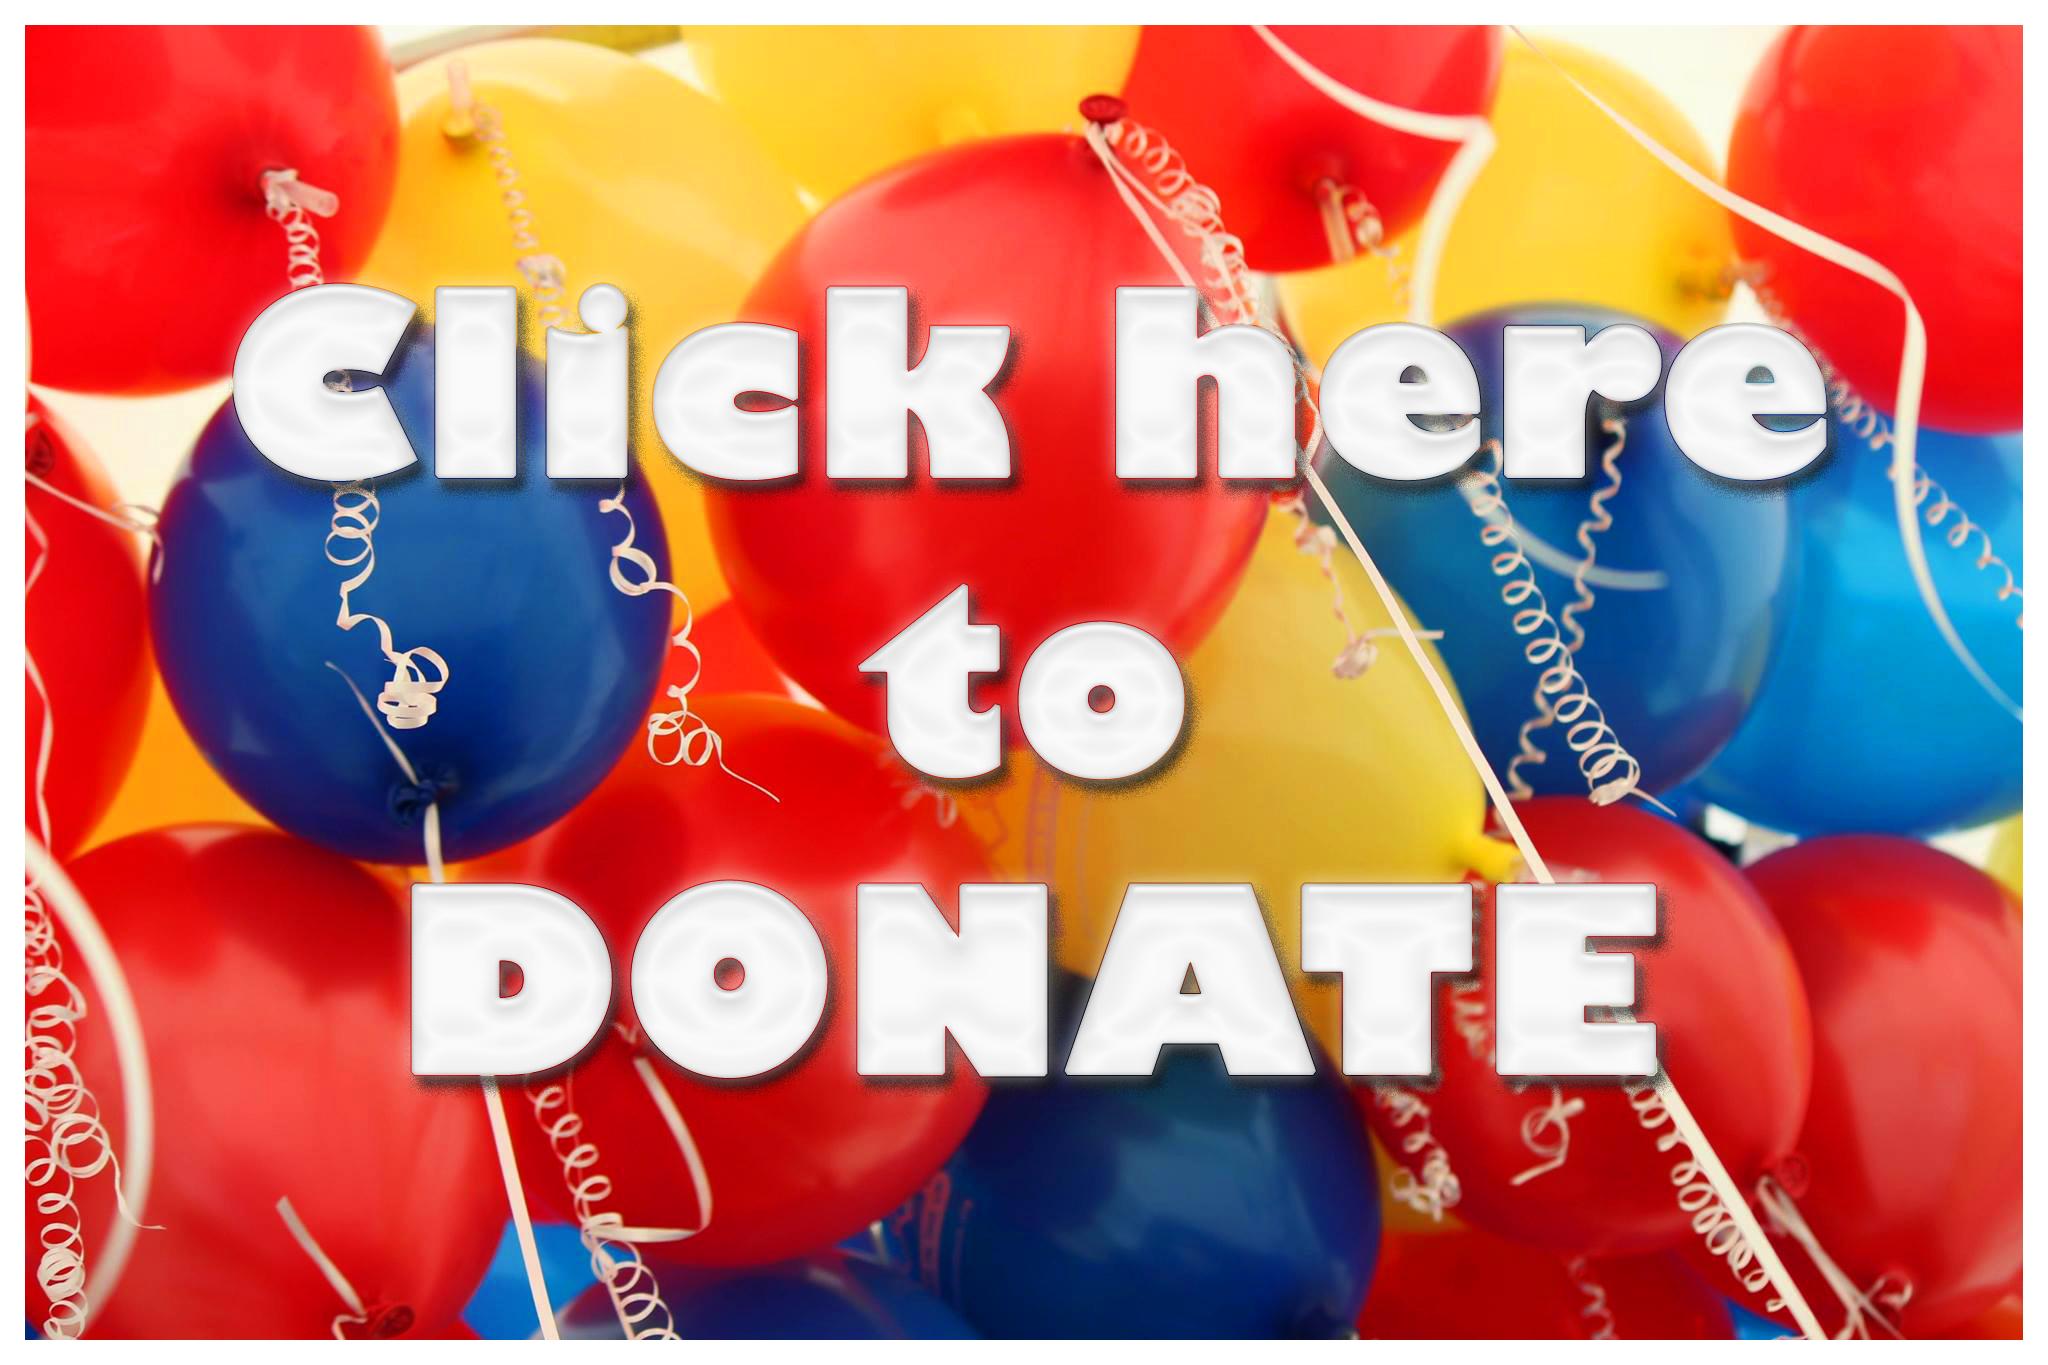 https://www.justgiving.com/specialkids/donate